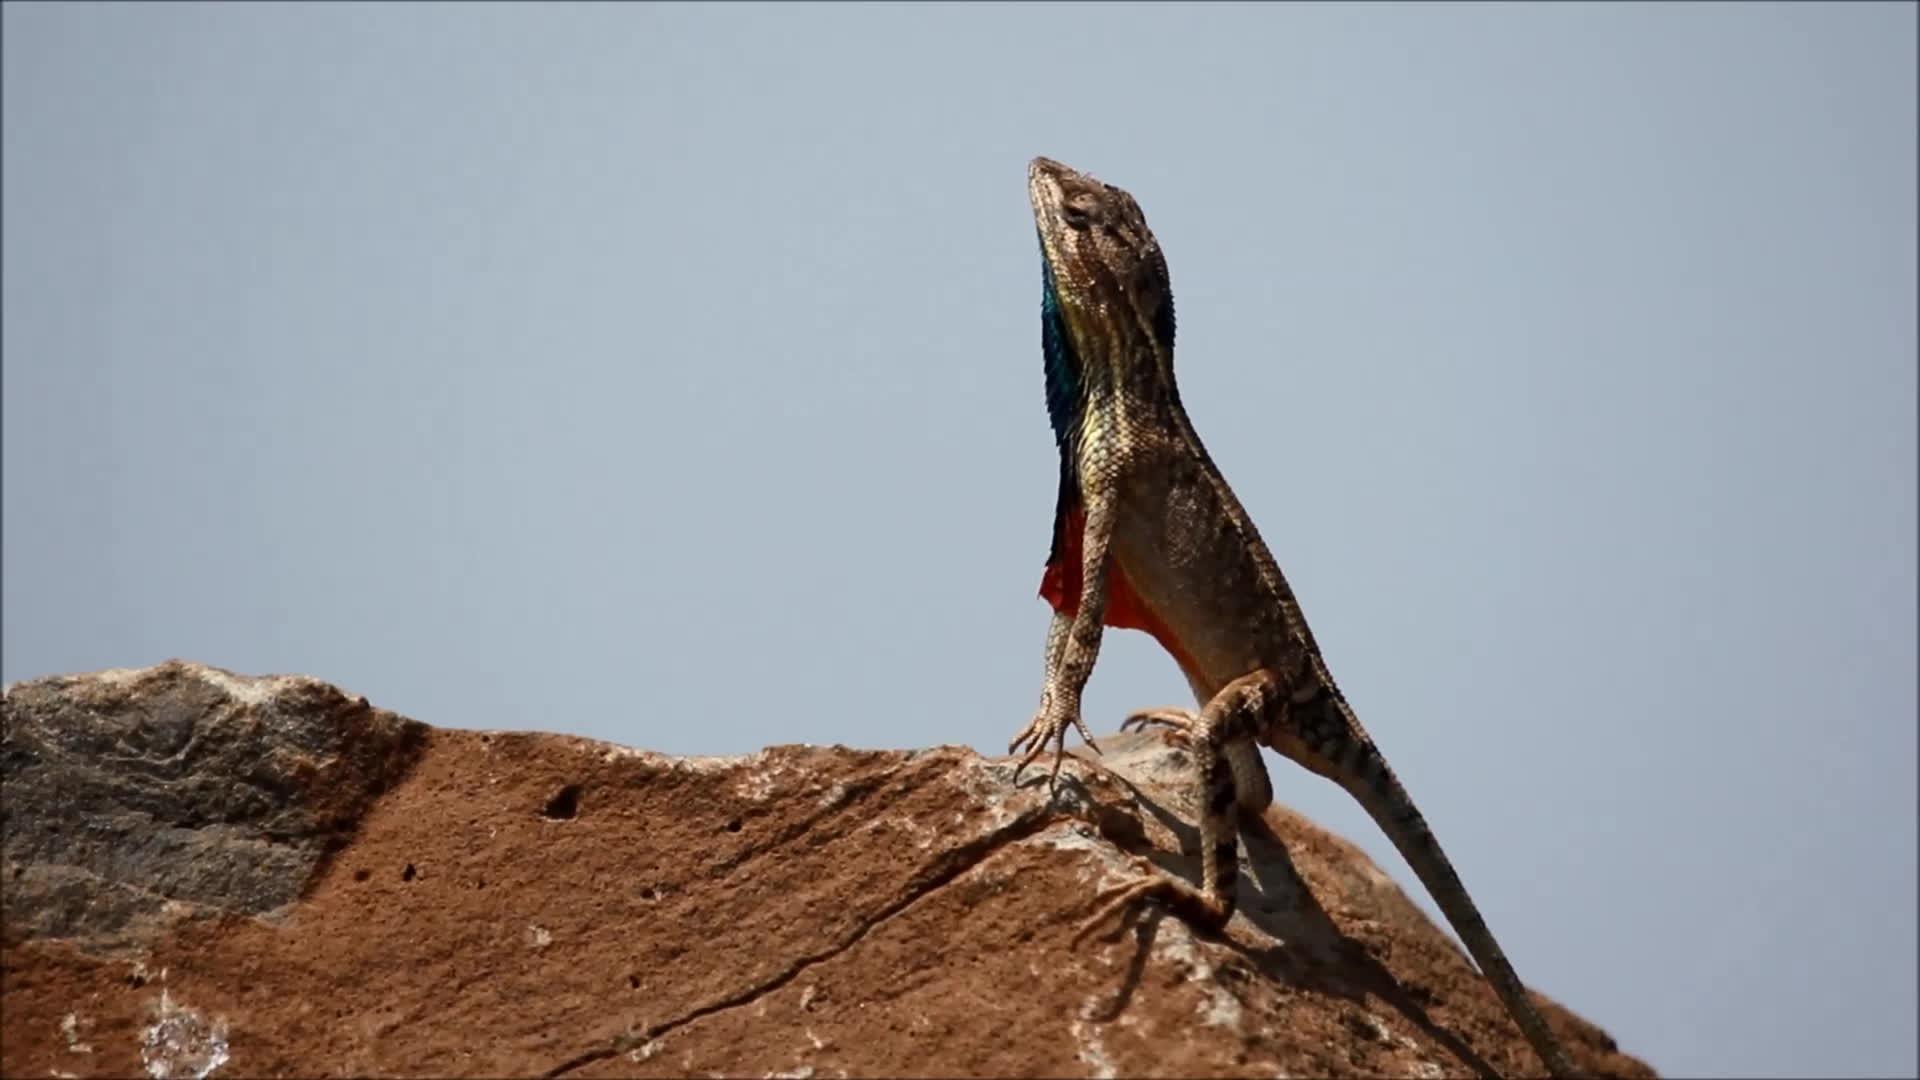 NatureGifs, fan Throated lizard  (Sitana ponticeriana) GIFs